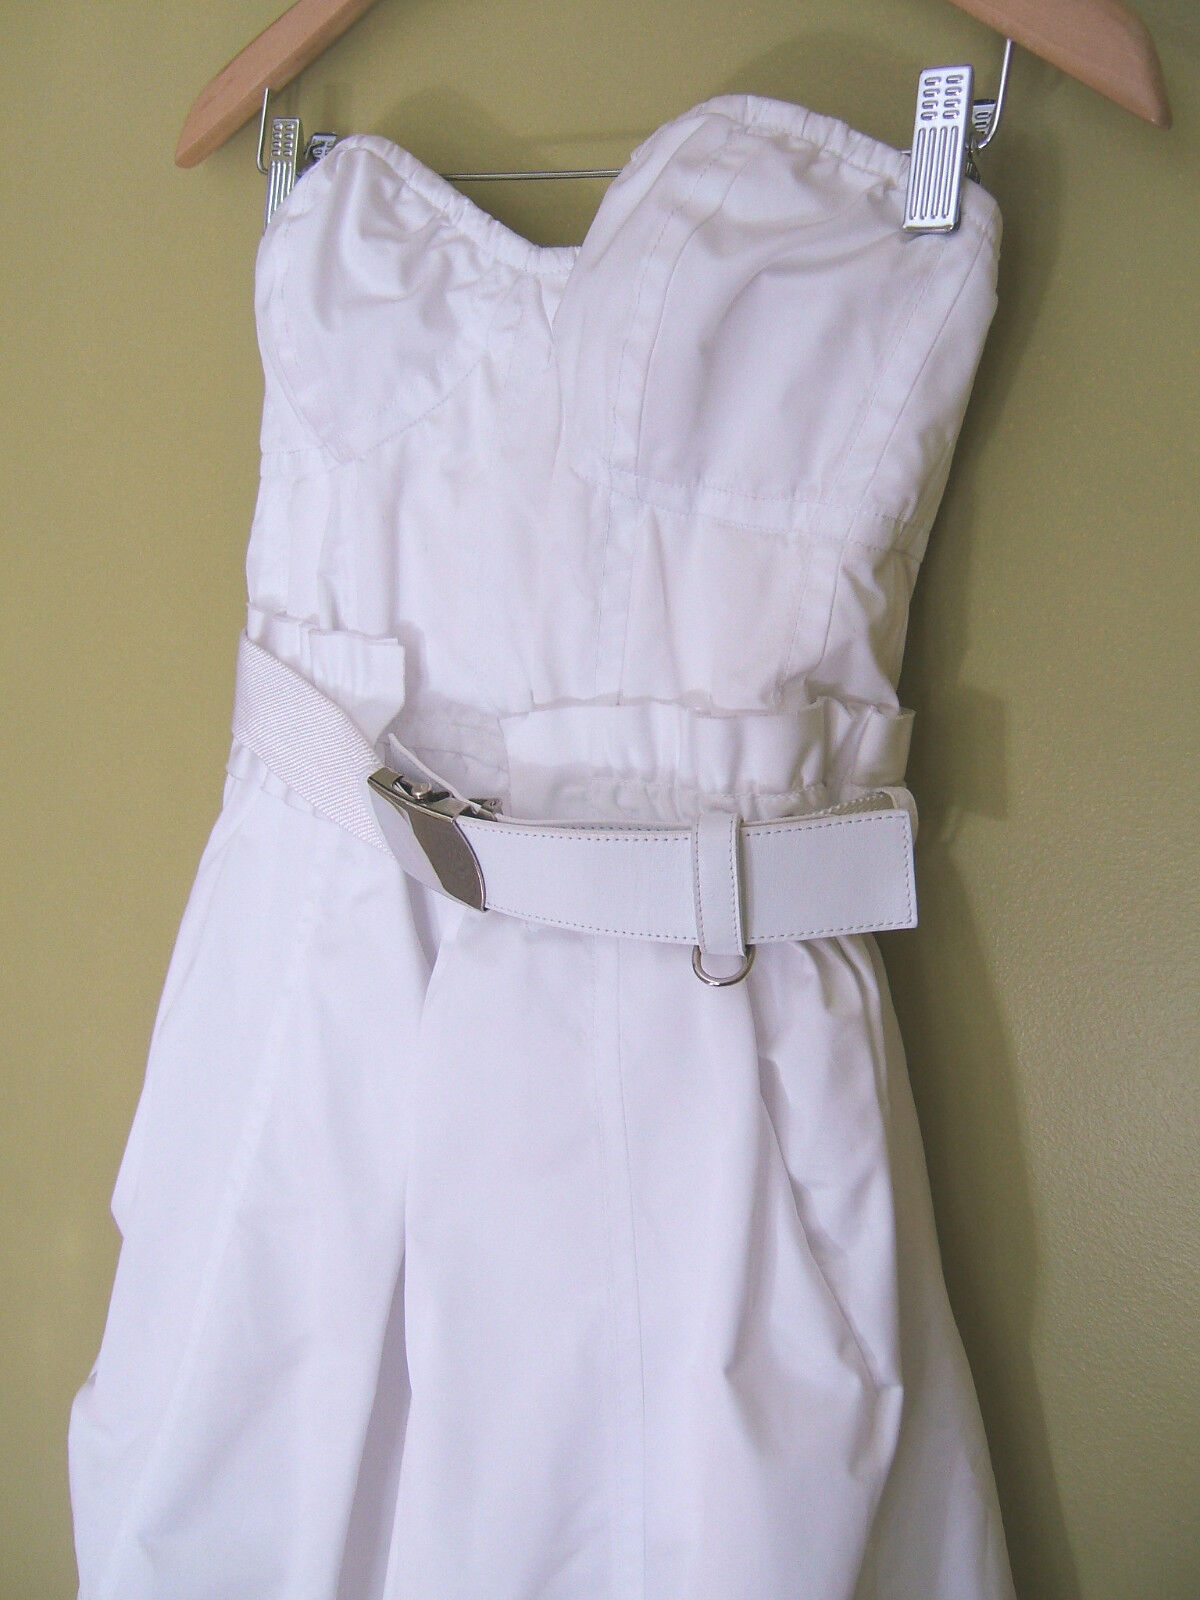 NWT Marc Jacobs Ivory Radzimir Petticoat Strapless Strapless Strapless Belted Bustier Dress 6  2,200 f1292c